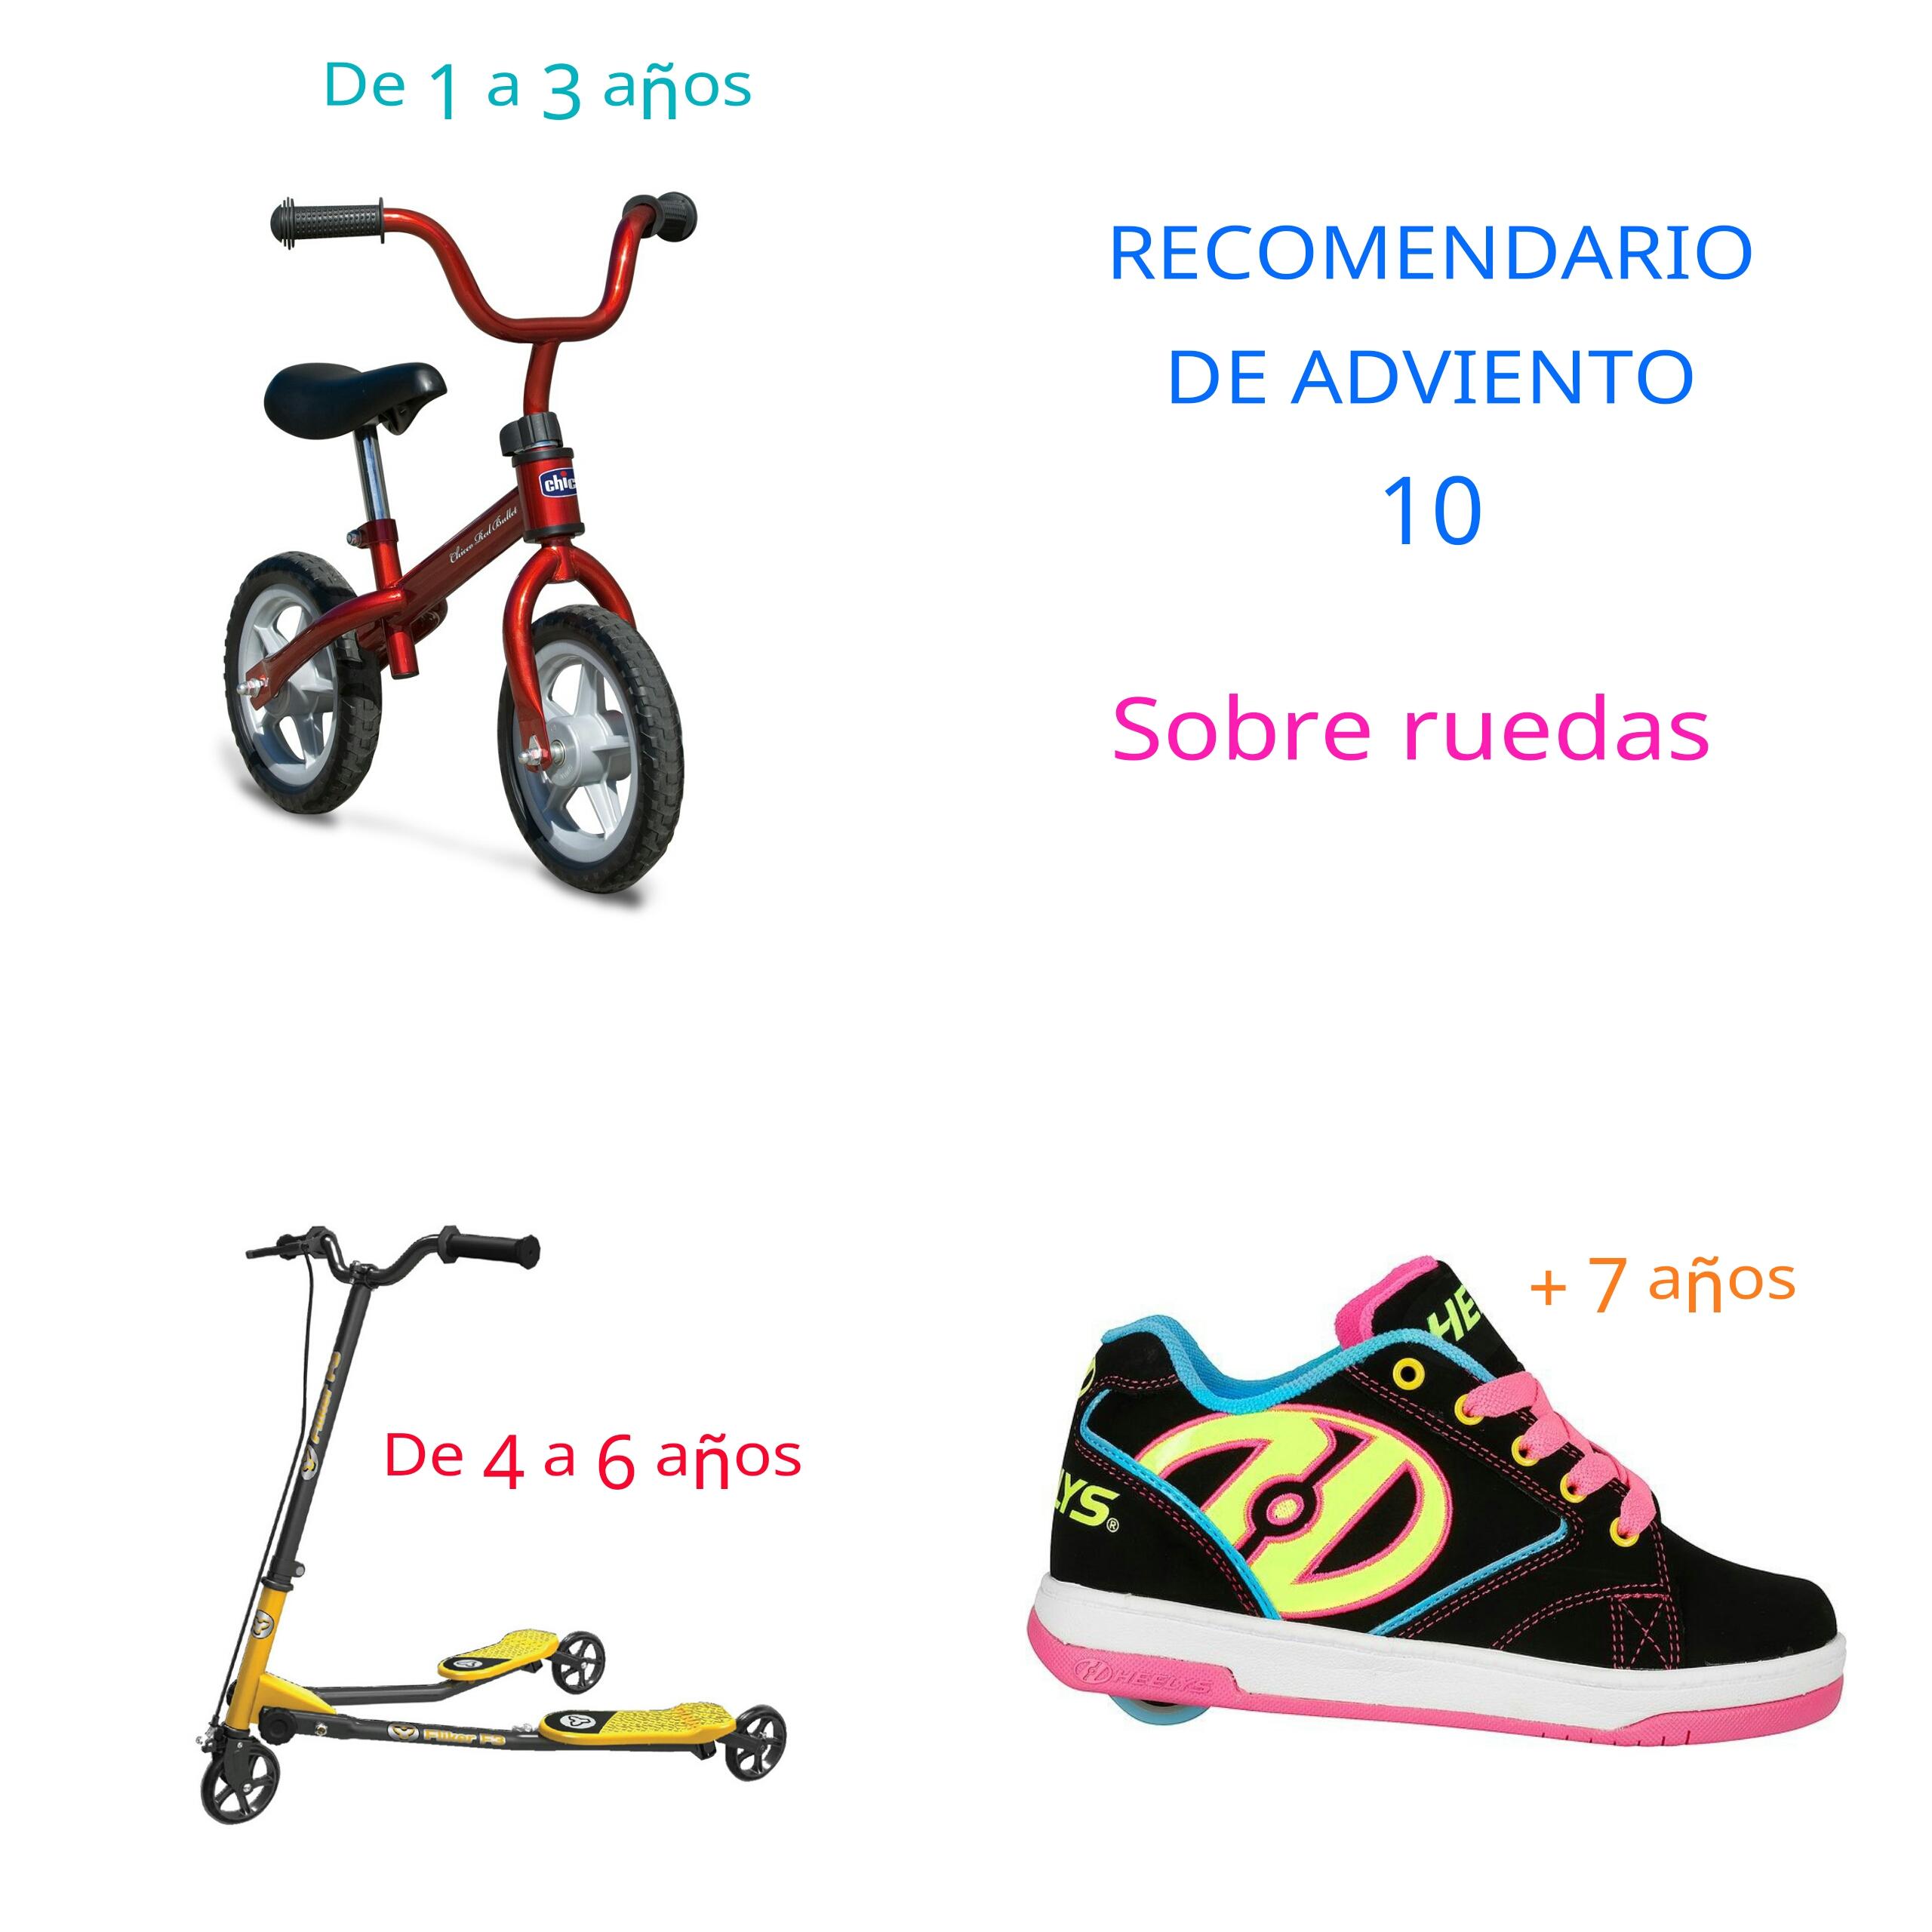 Ideas Para Regalar A Niños Recomendario De Adviento Días 7 A 12